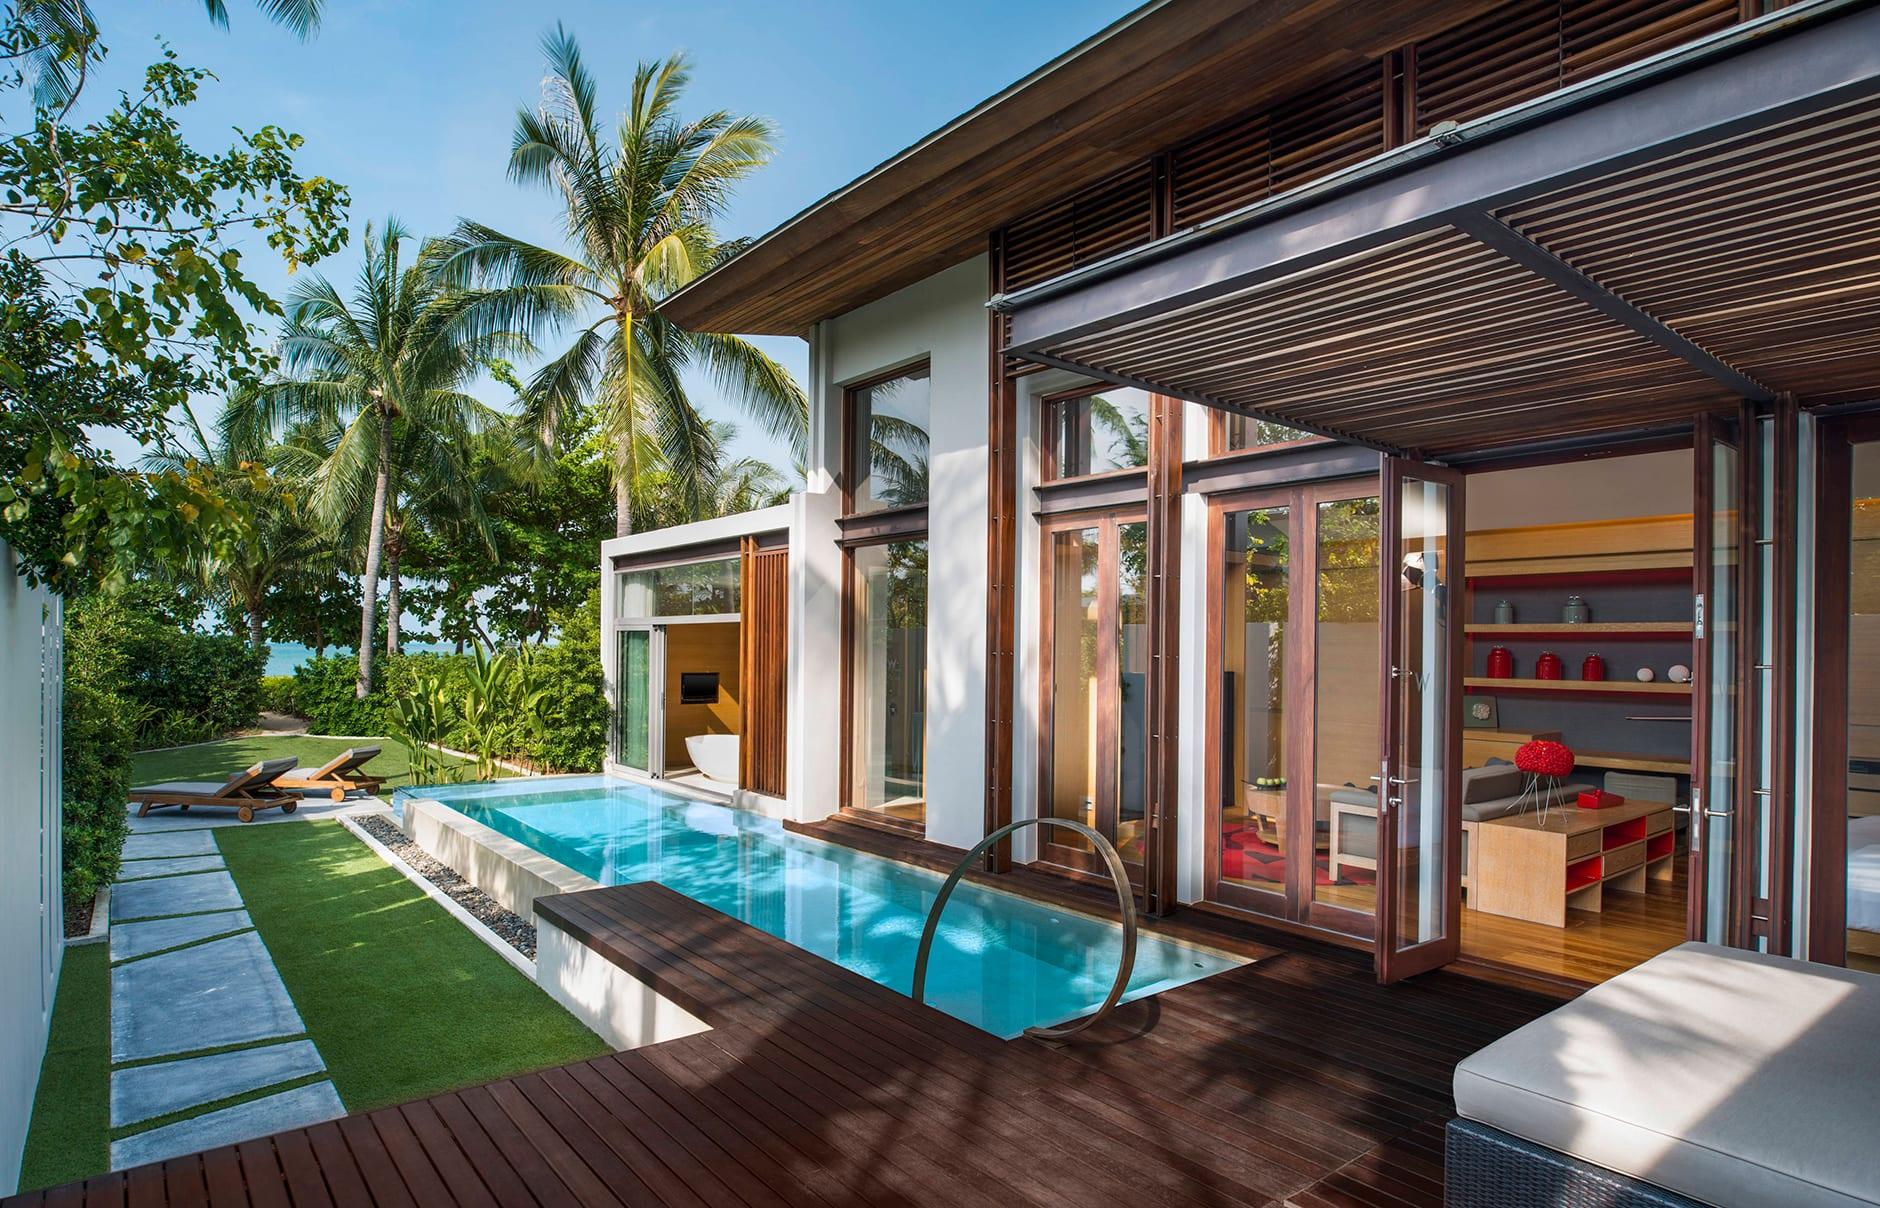 W Koh Samui, Thailand. Hotel Review by TravelPlusStyle. Photo © Marriott International